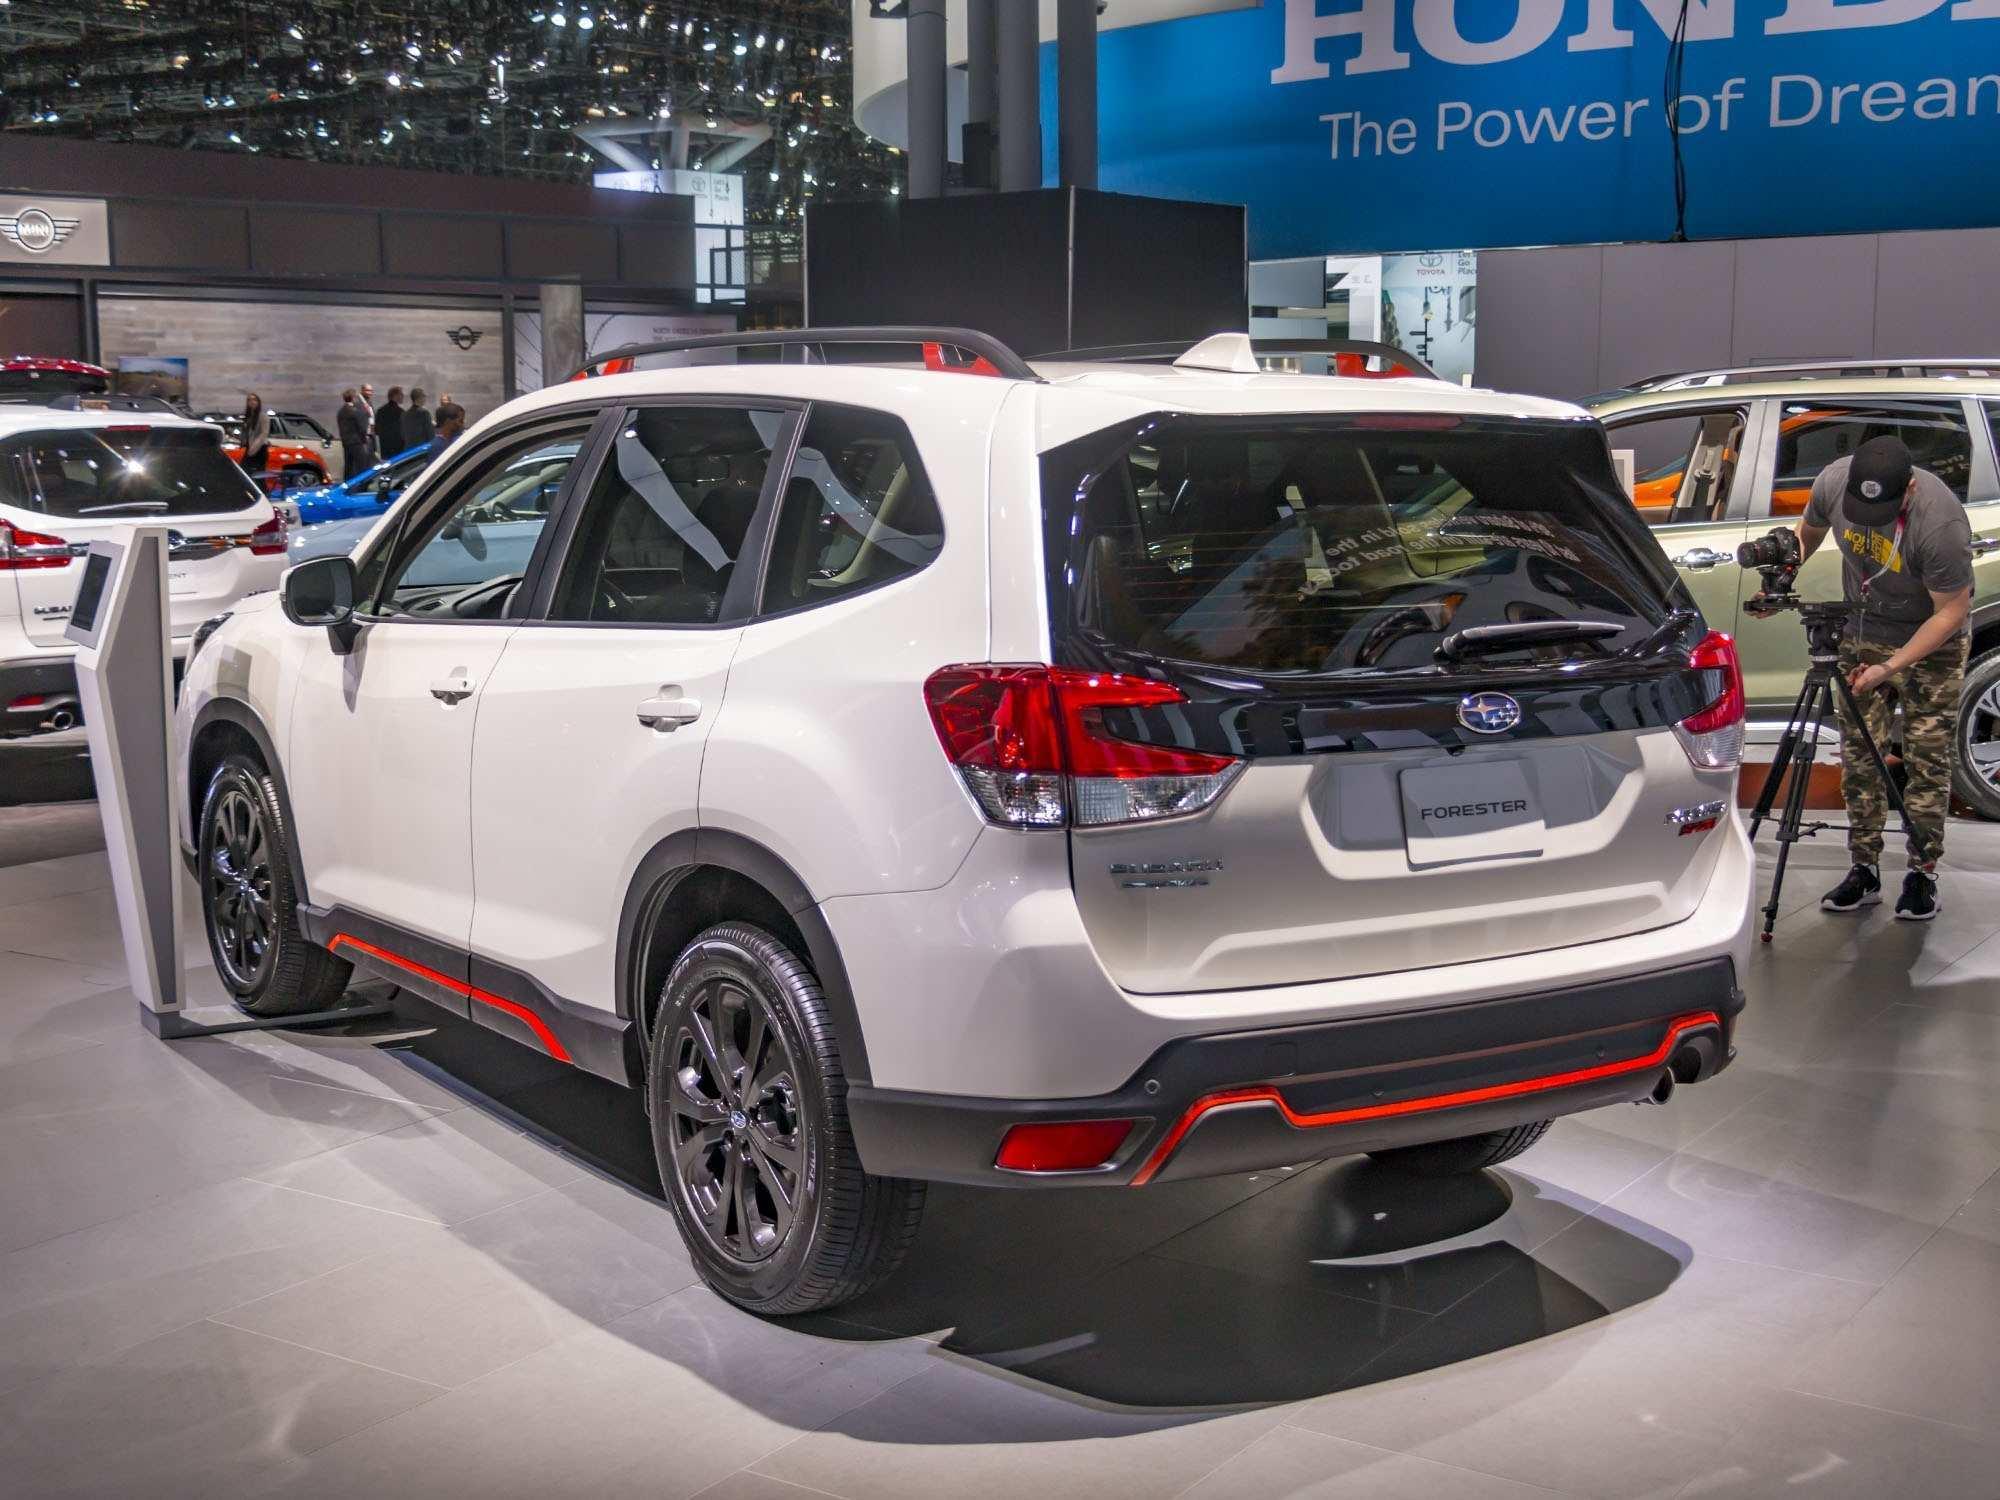 70 Gallery of Subaru Forester 2019 Green Spy Shoot Rumors with Subaru Forester 2019 Green Spy Shoot